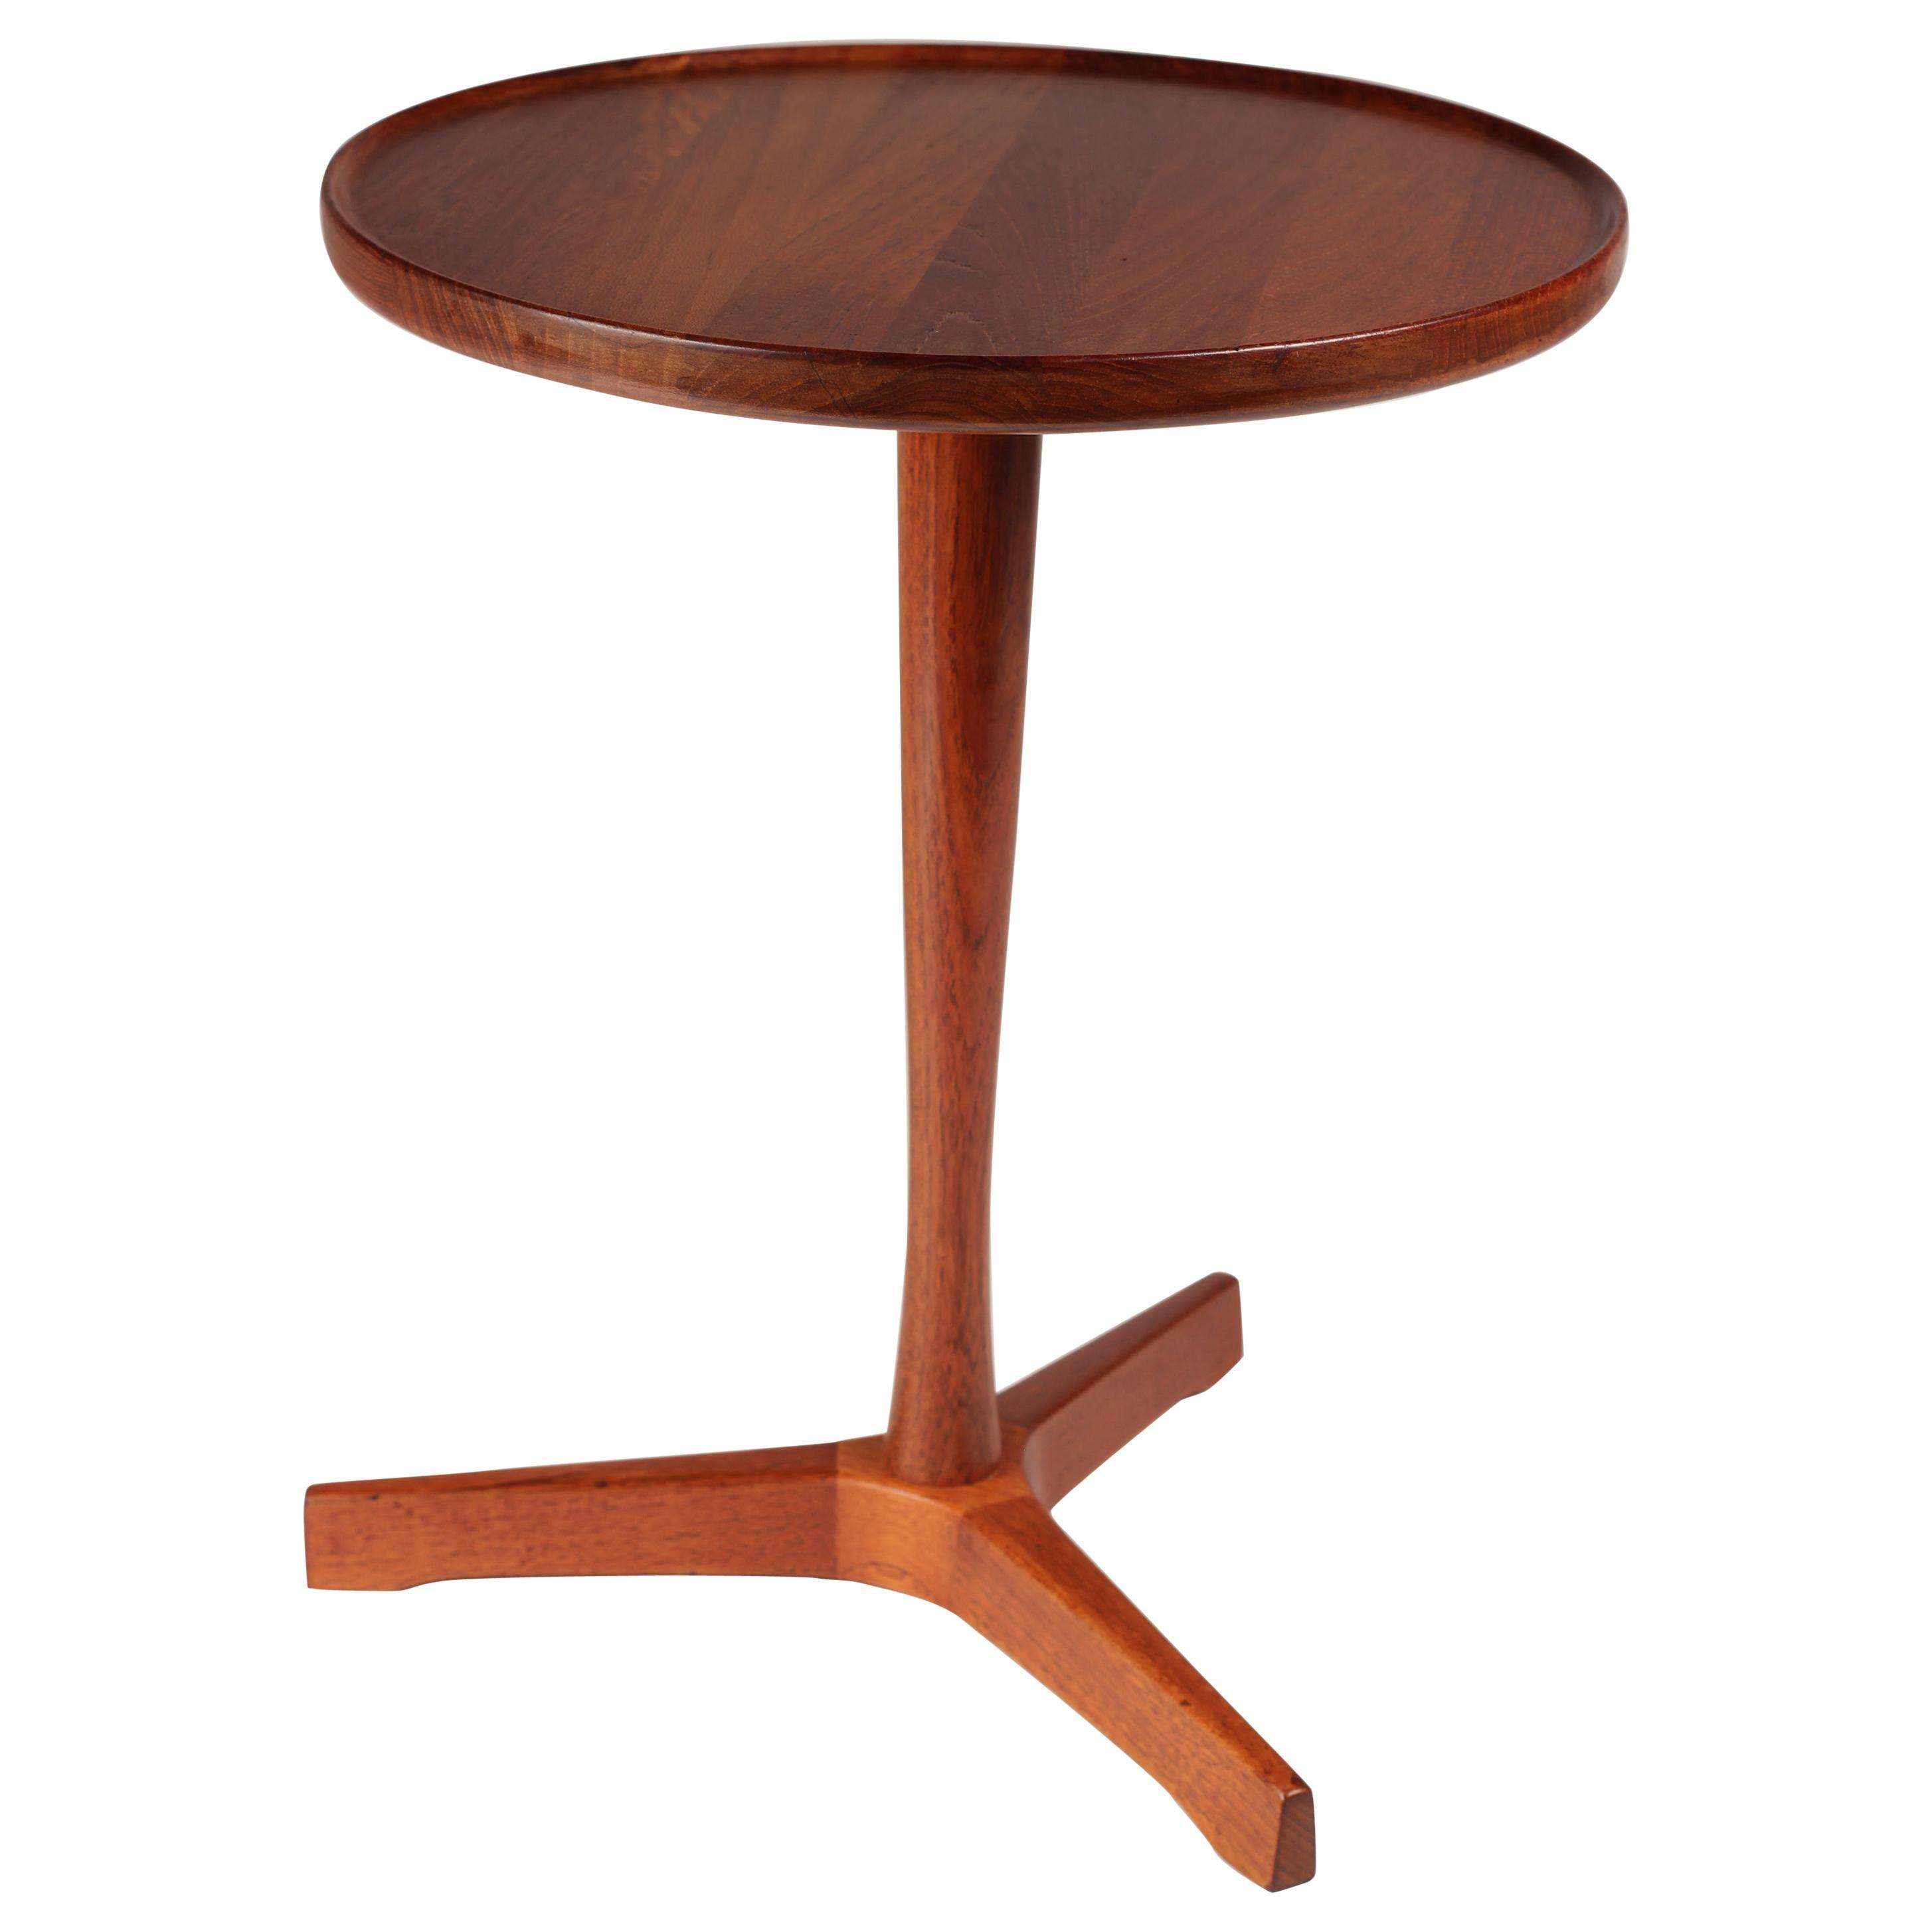 Scandinavian Modern Danish Teak Side Table Designed by Hans Andersen